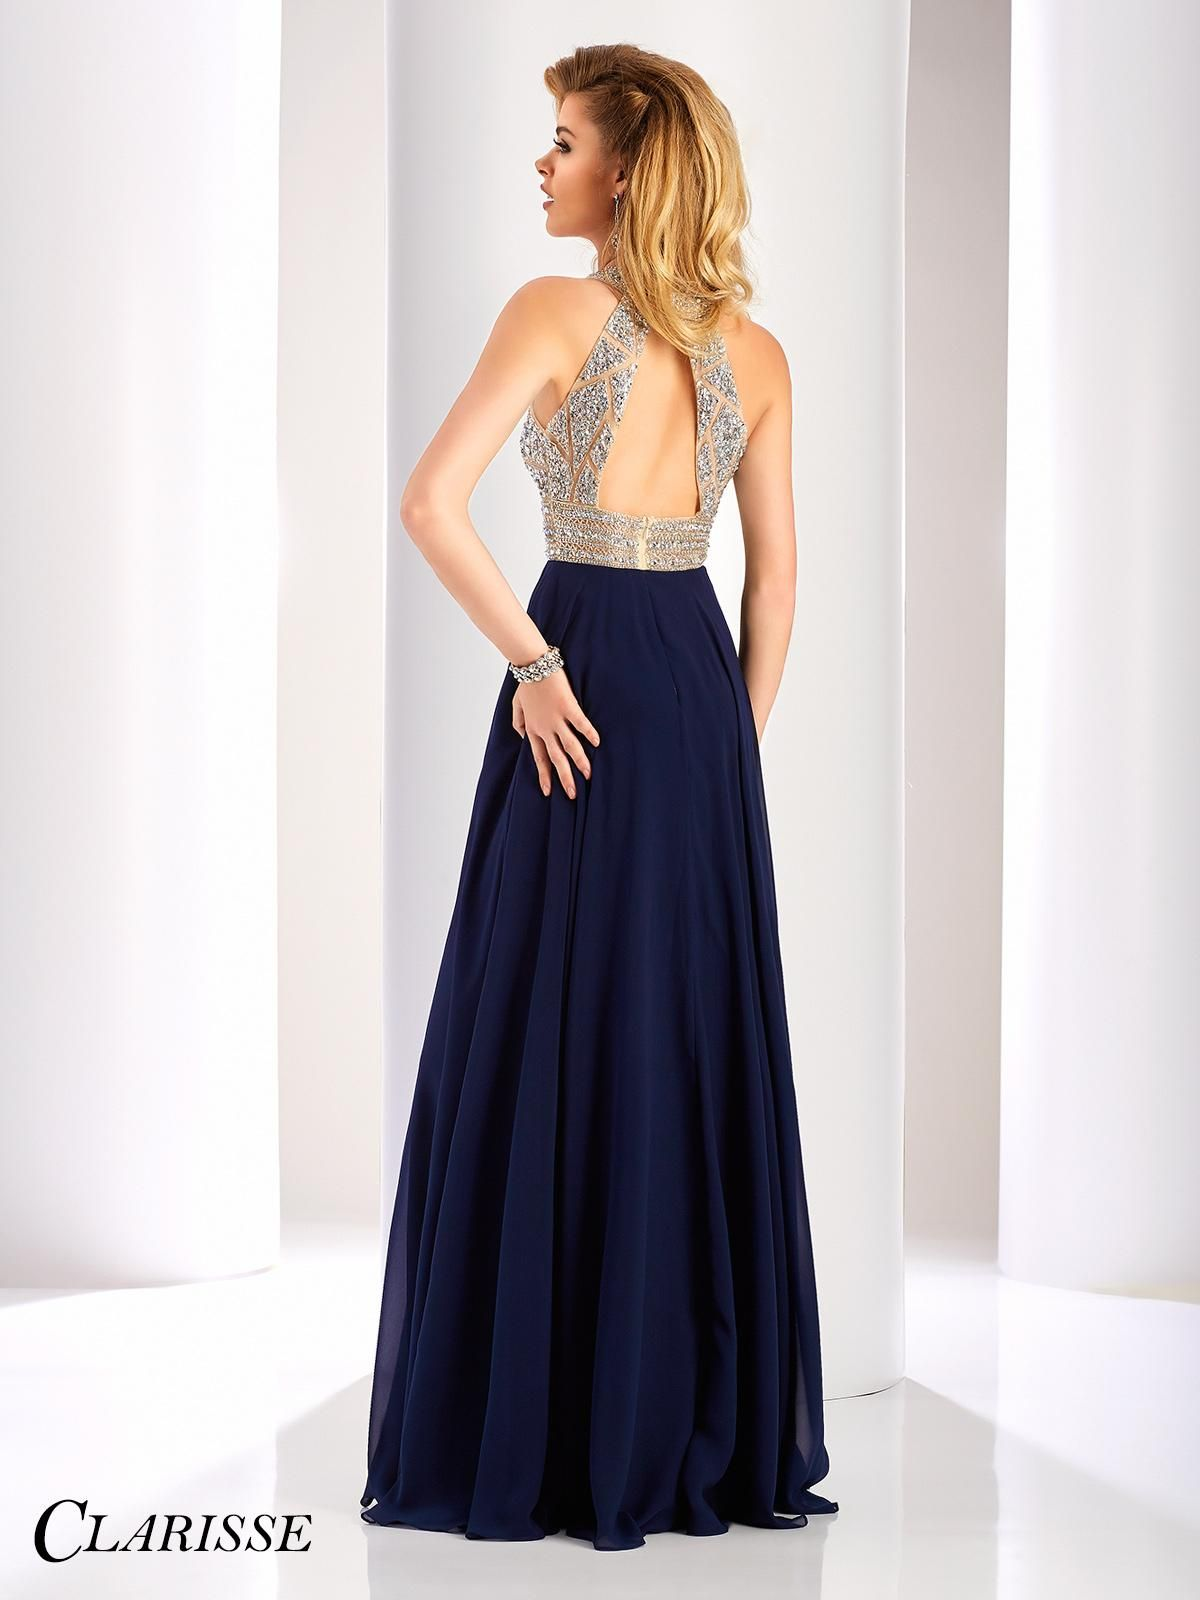 Clarisse spring clarisse chiffon prom dress